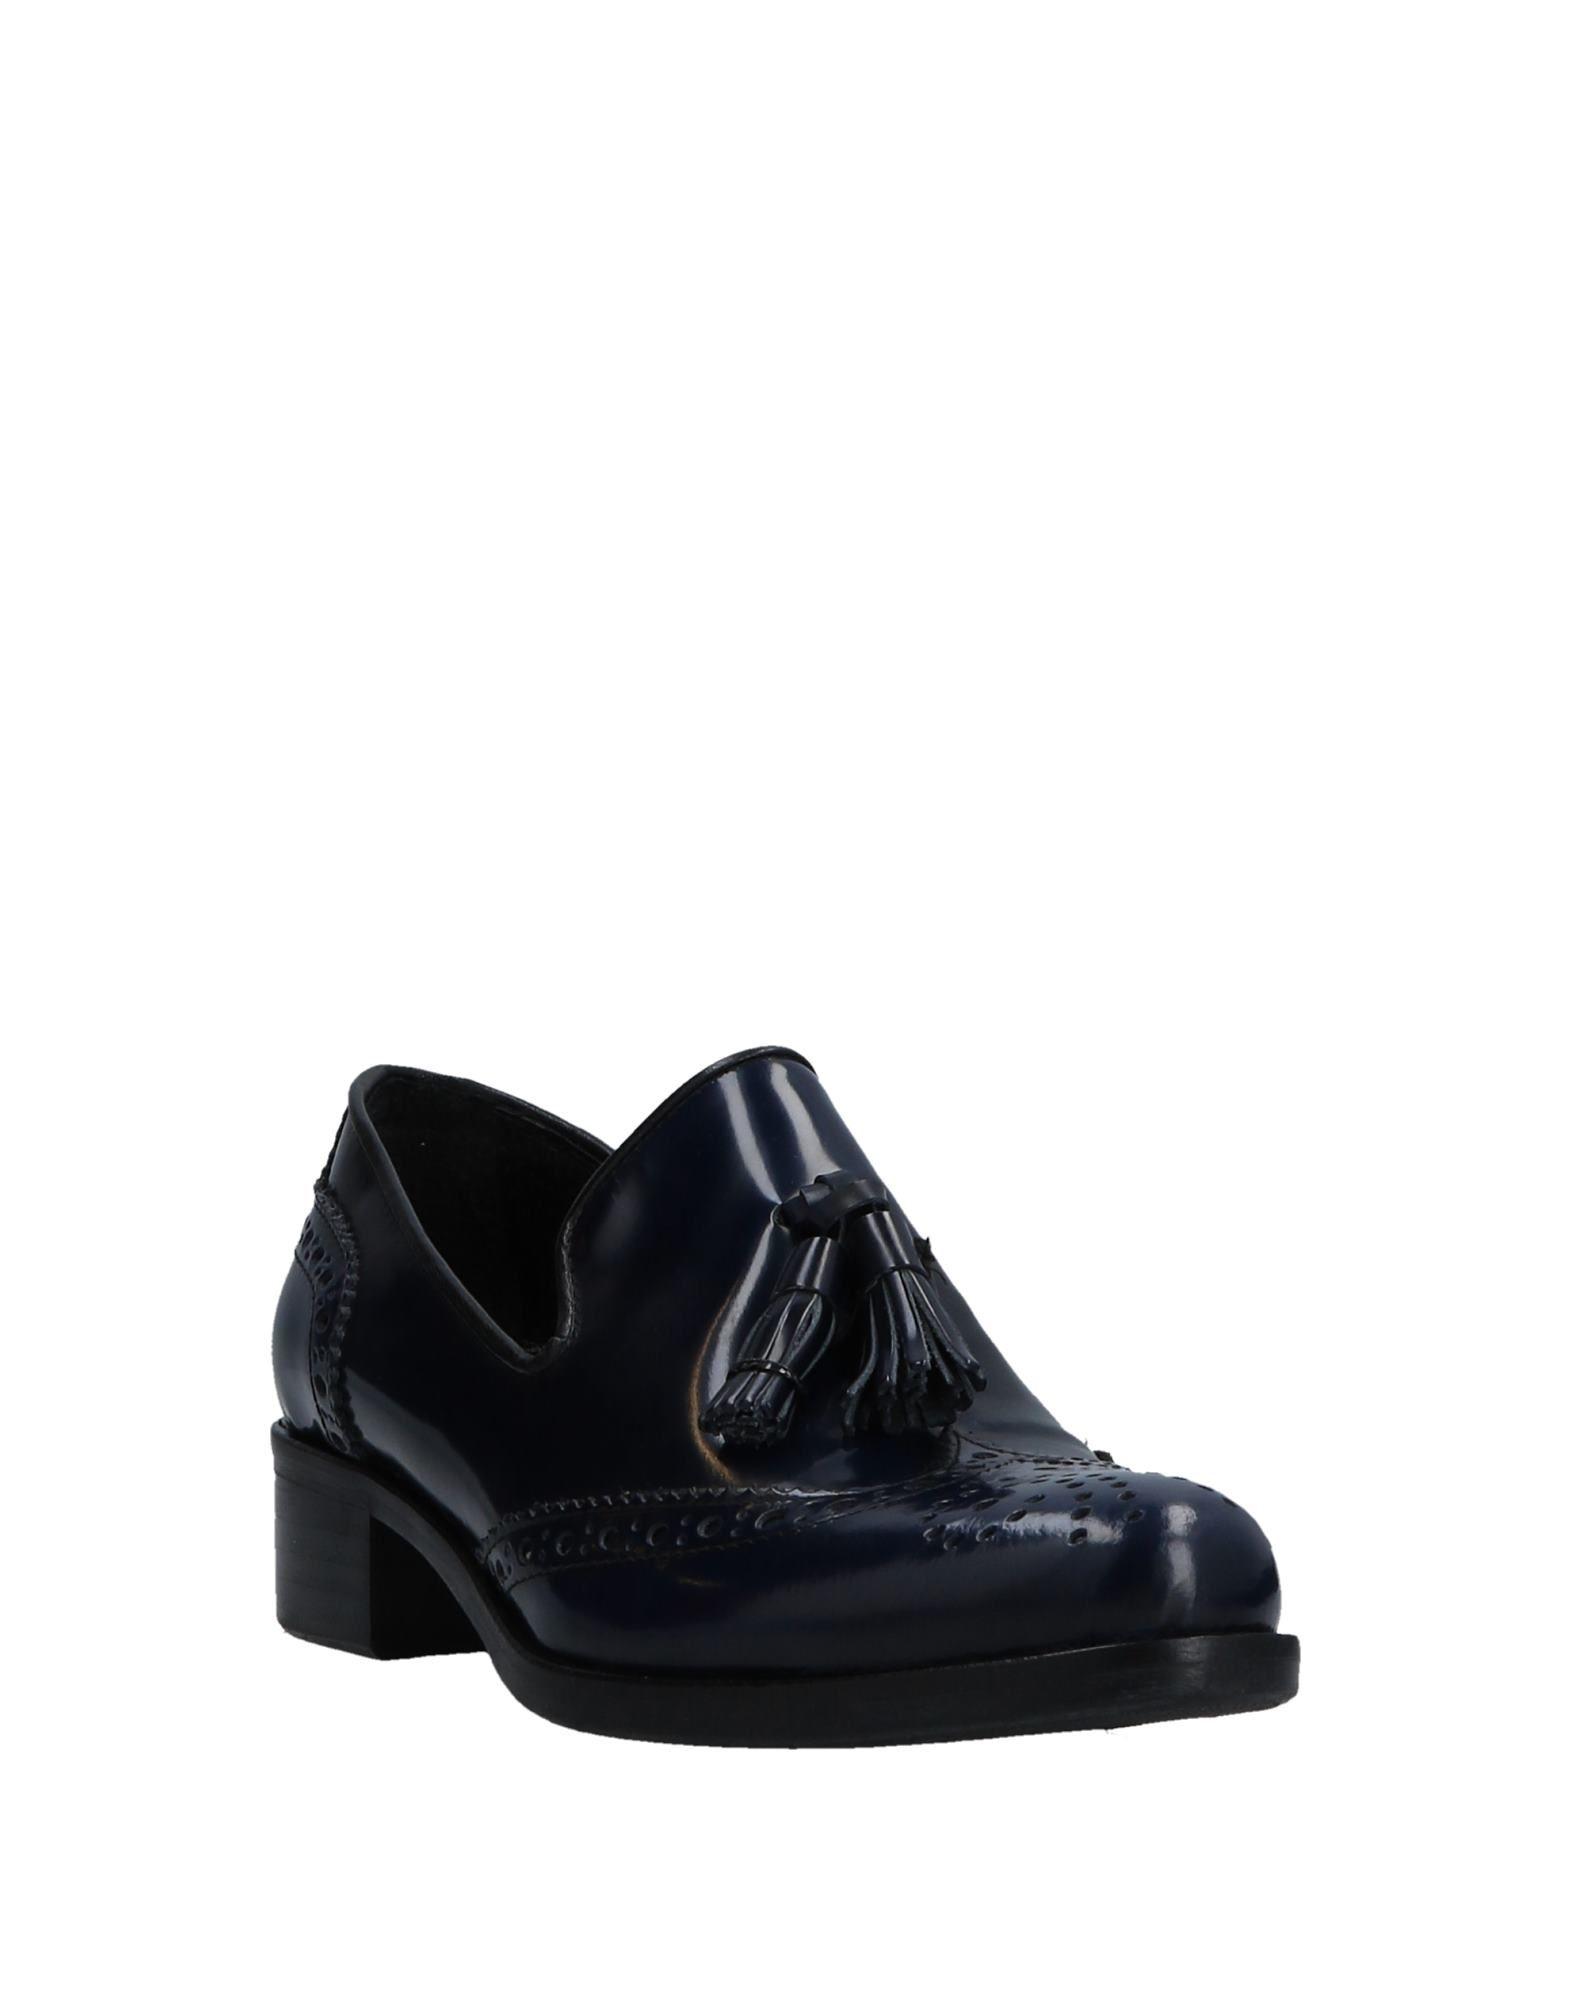 Vsl Loafers - on Women Vsl Loafers online on -  United Kingdom - 11532710GT 943884